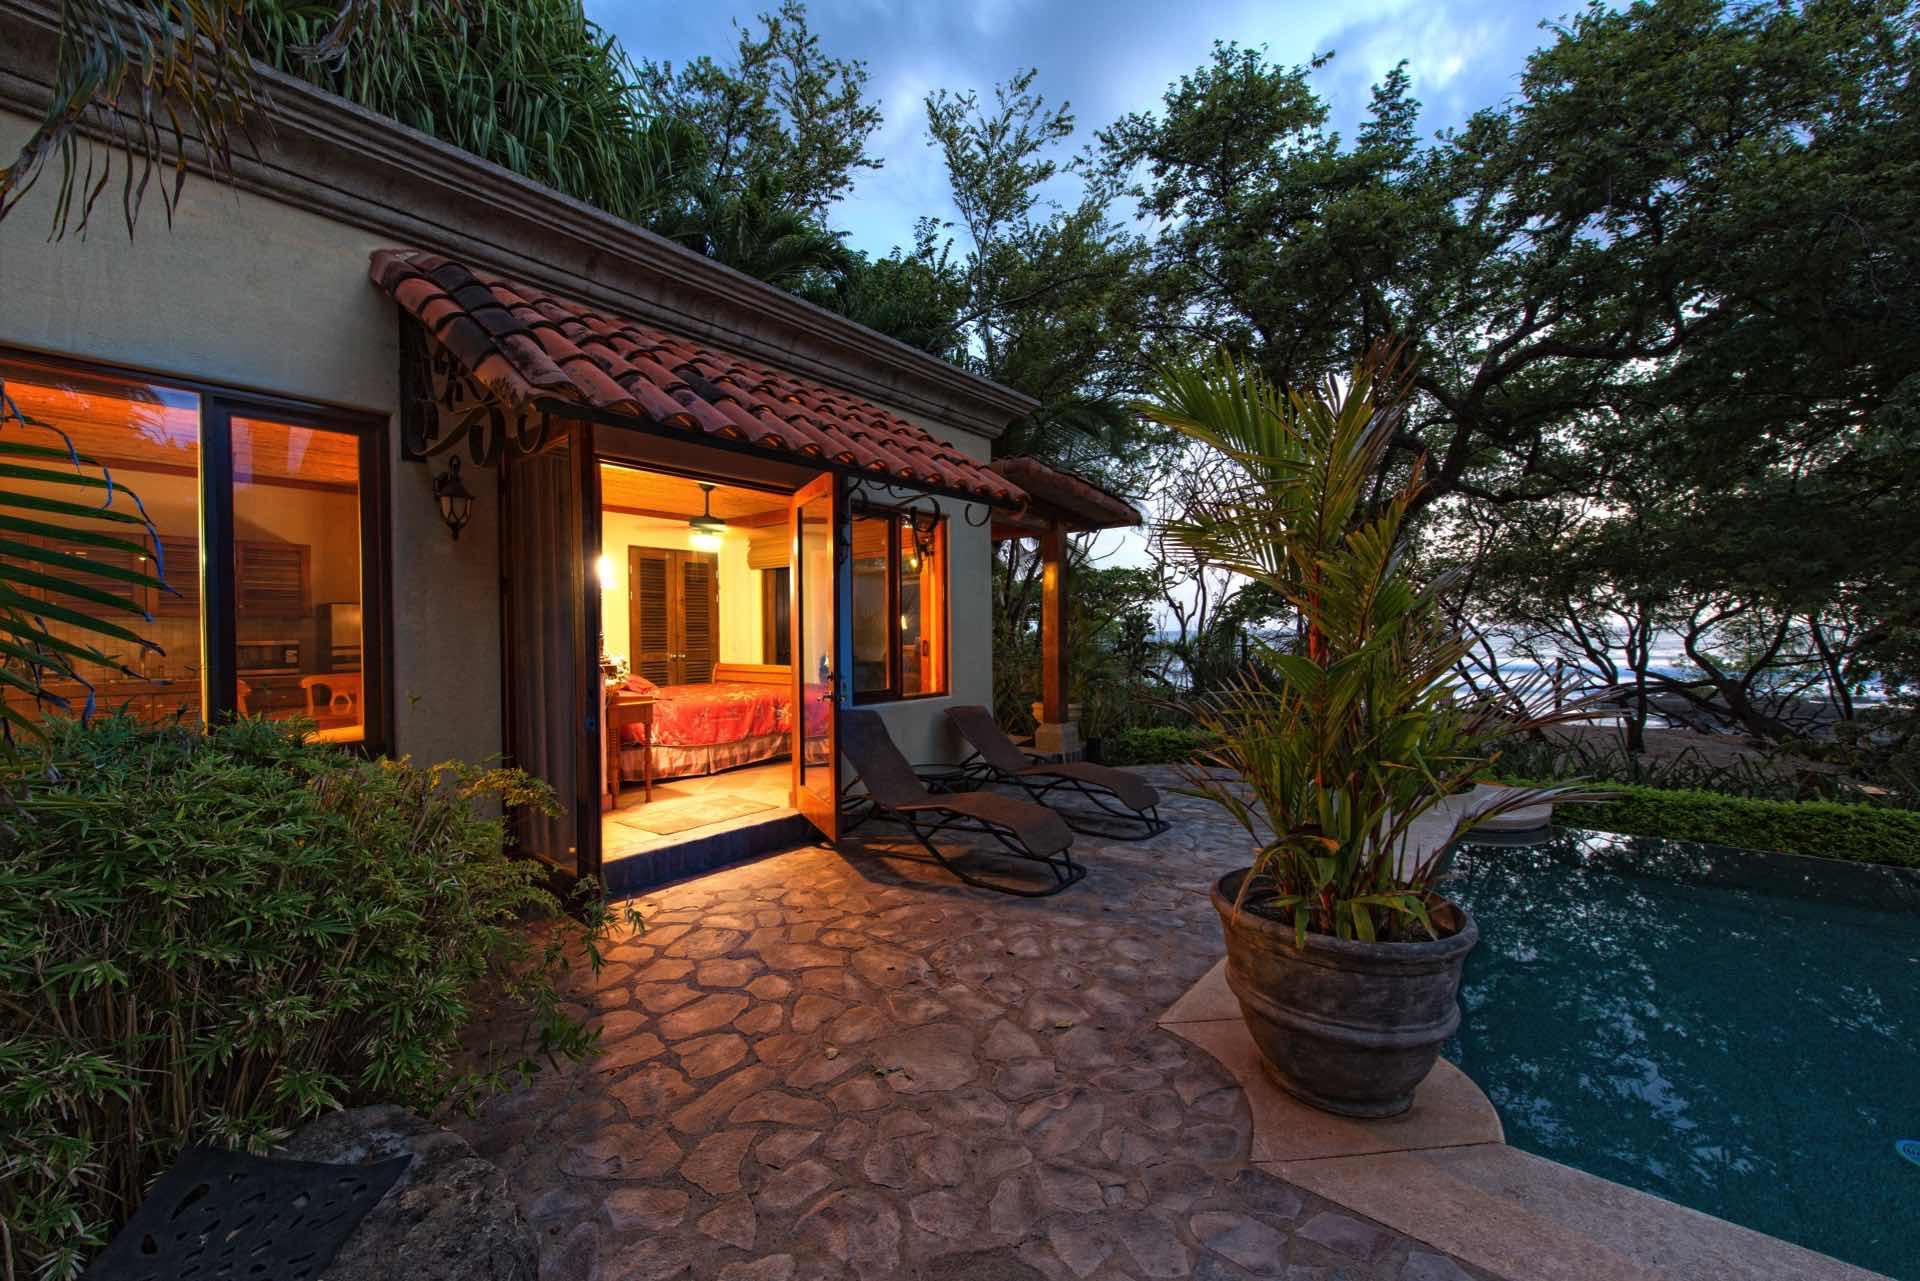 Beach Casita: the most romantic 5-star room for miles